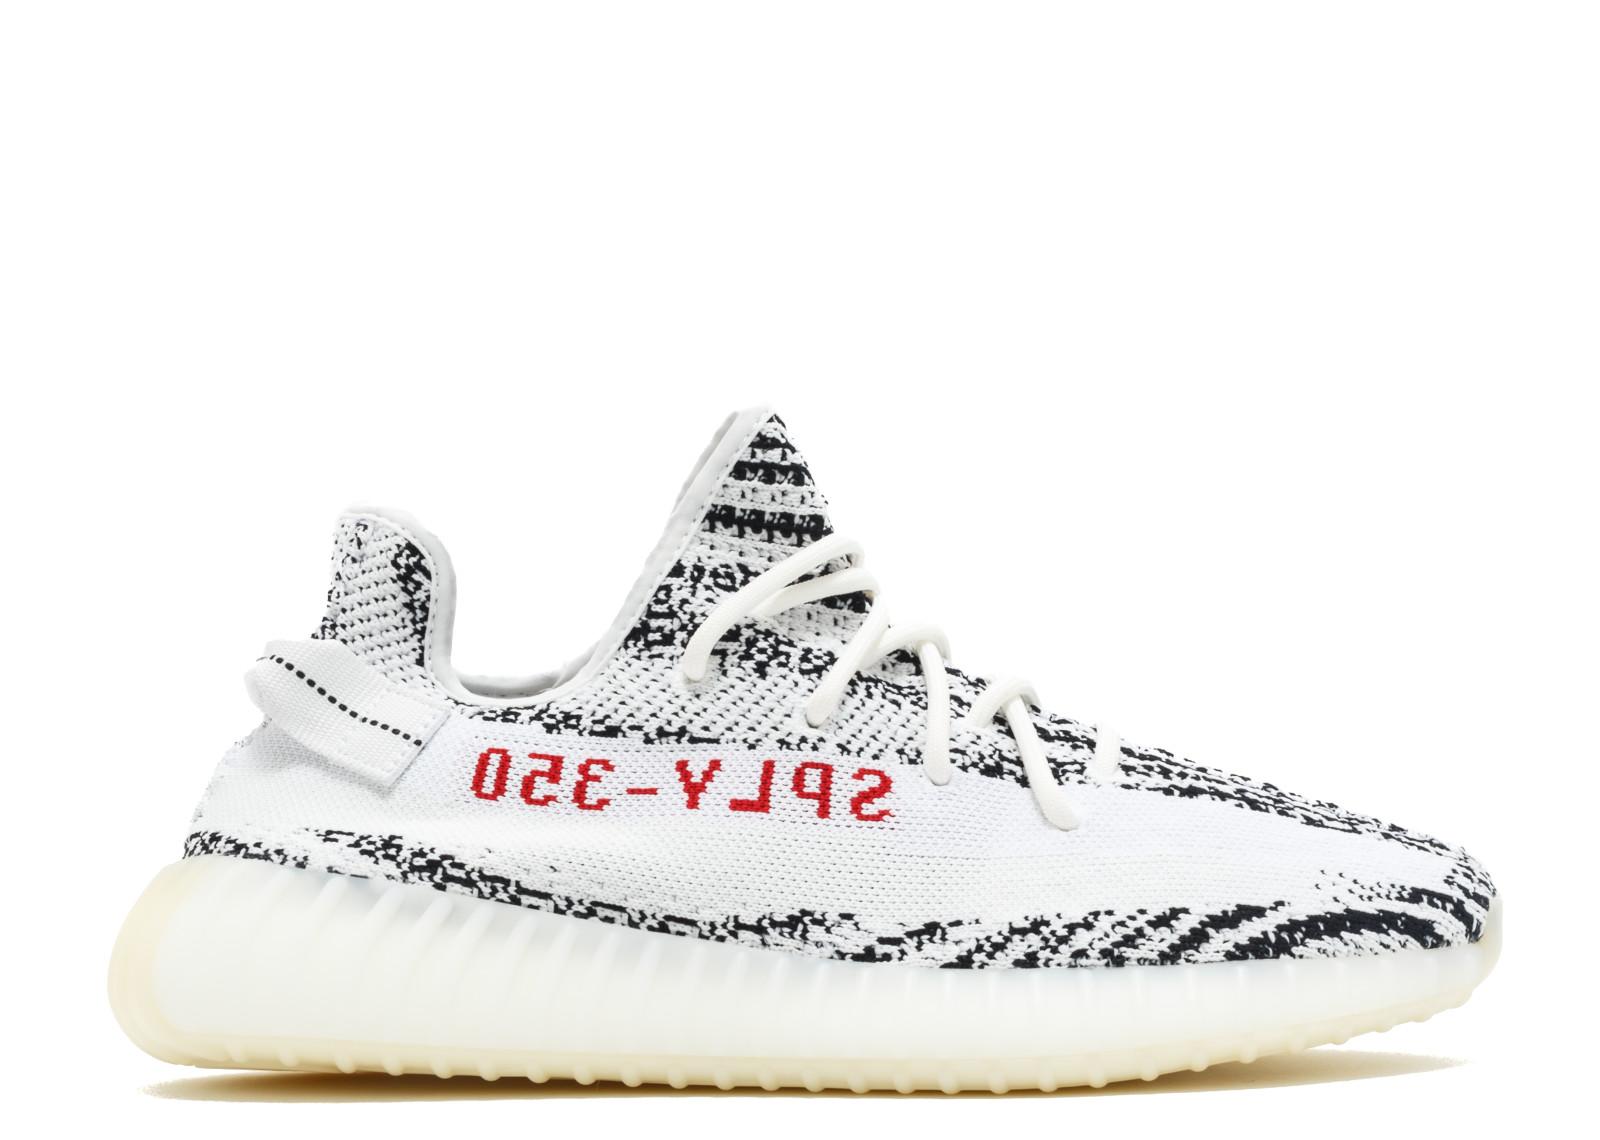 adidas yeezy boost 350 v2 zebra women